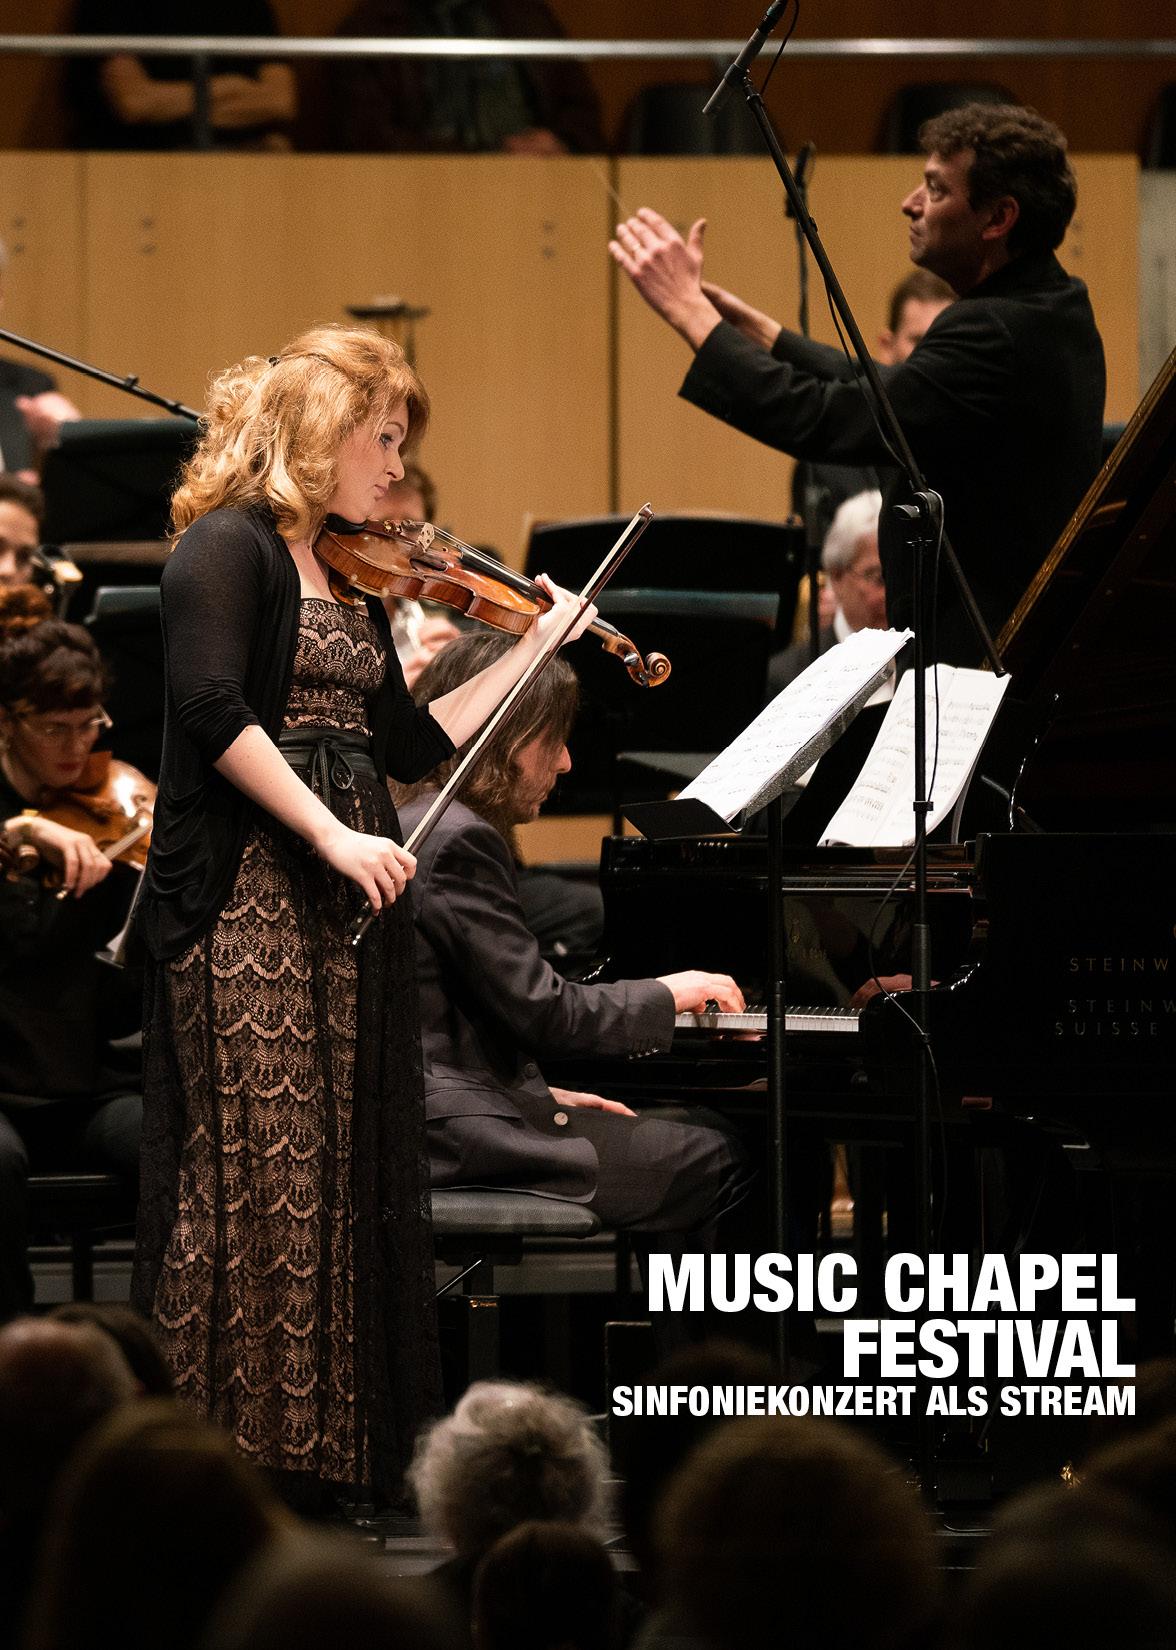 Music Chapel Festival